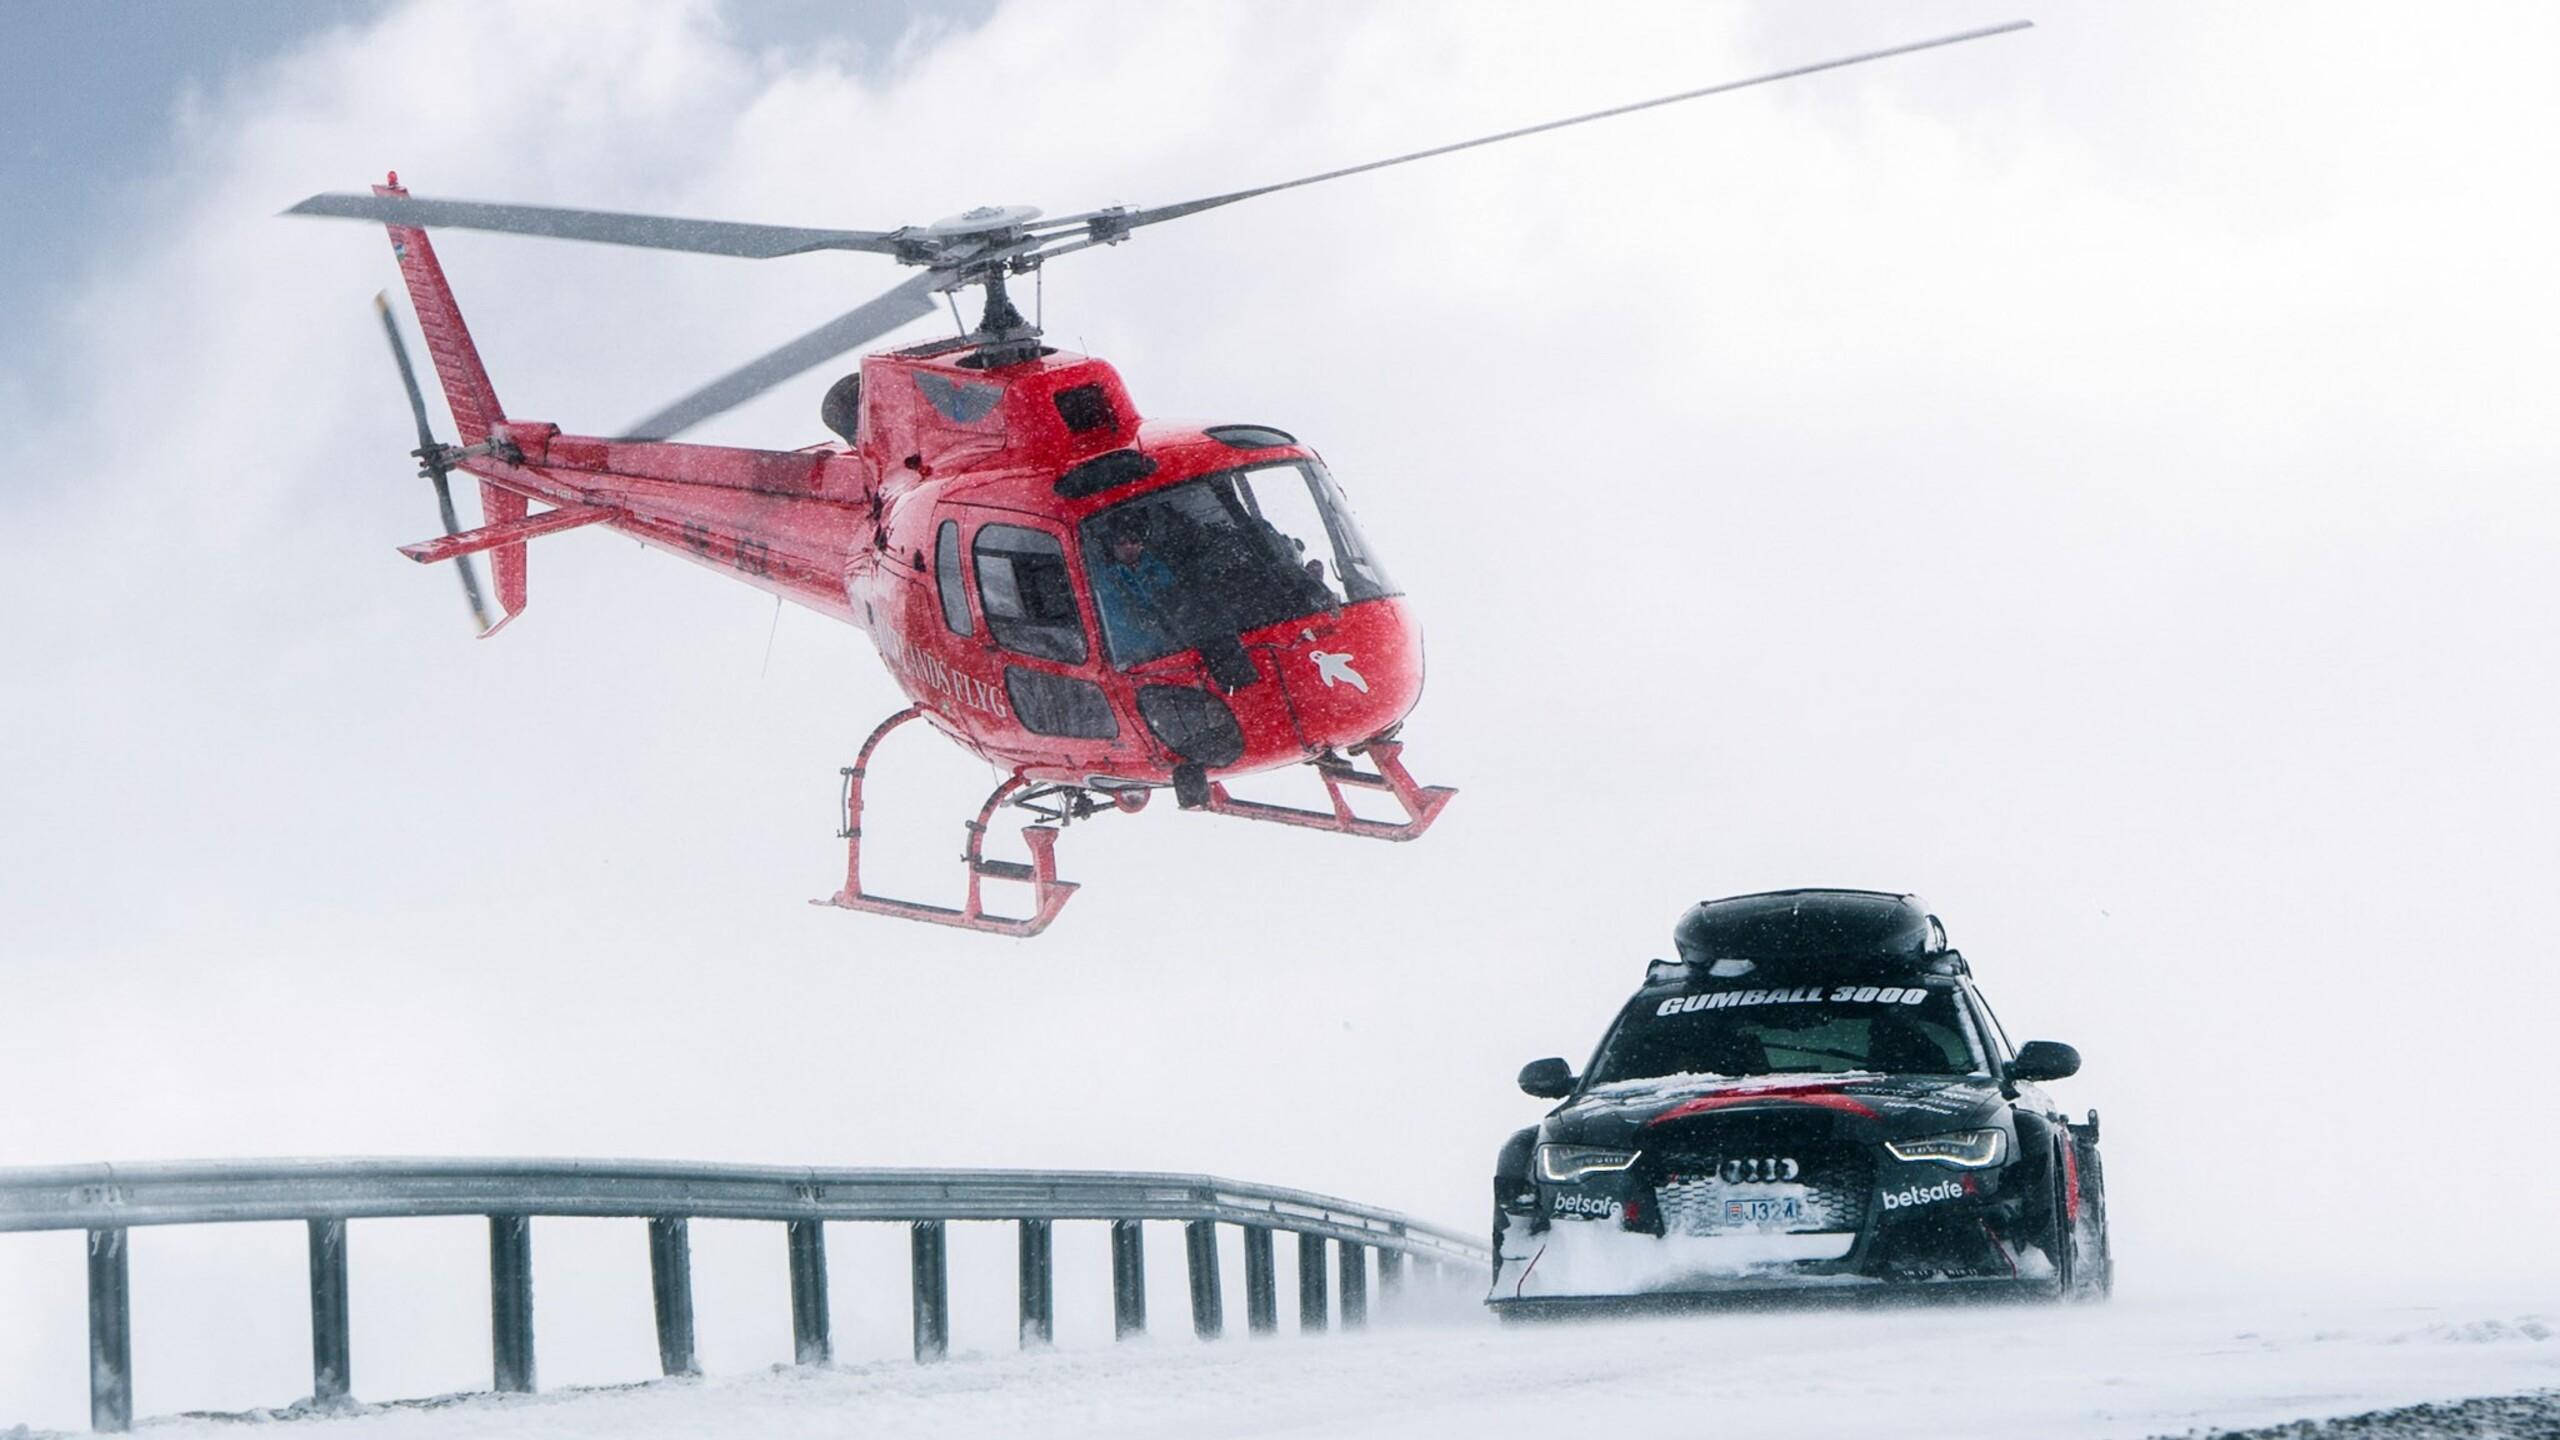 audi-rs6-snow-racing-image.jpg